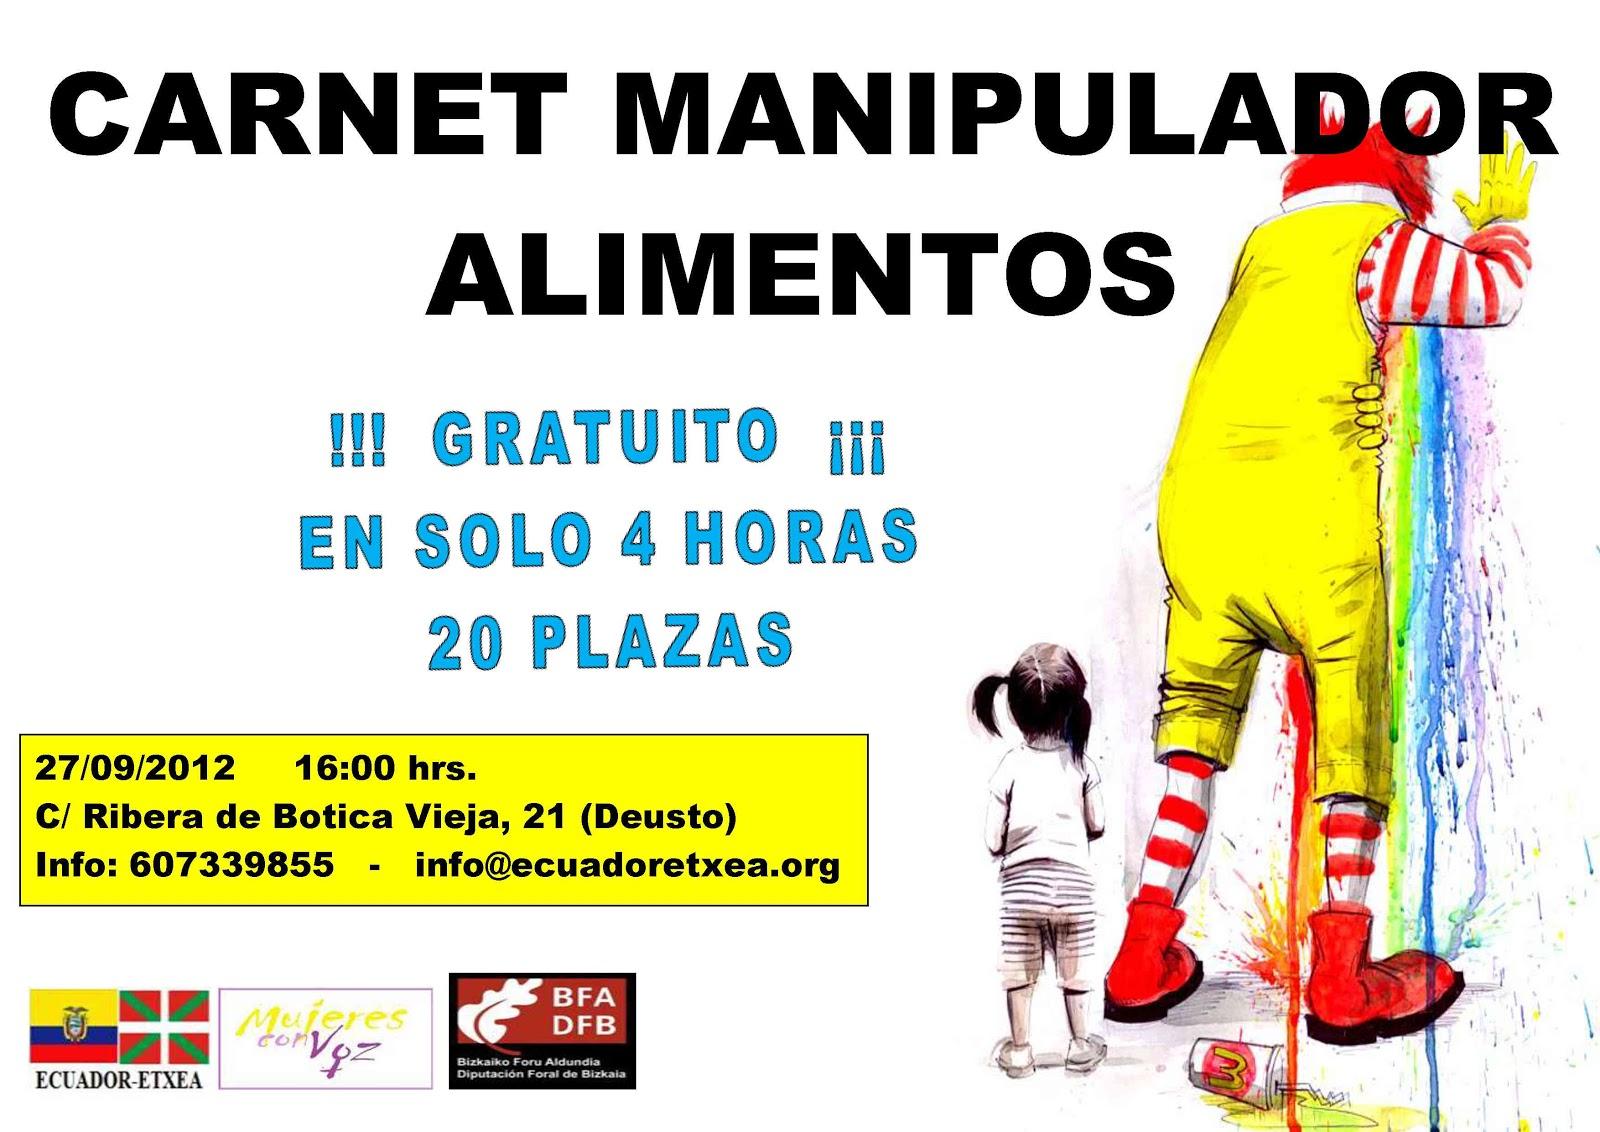 Ecuador etxea oficial curso carnet de manipulador de alimentos gratuito - Certificado de manipulador de alimentos gratis online ...